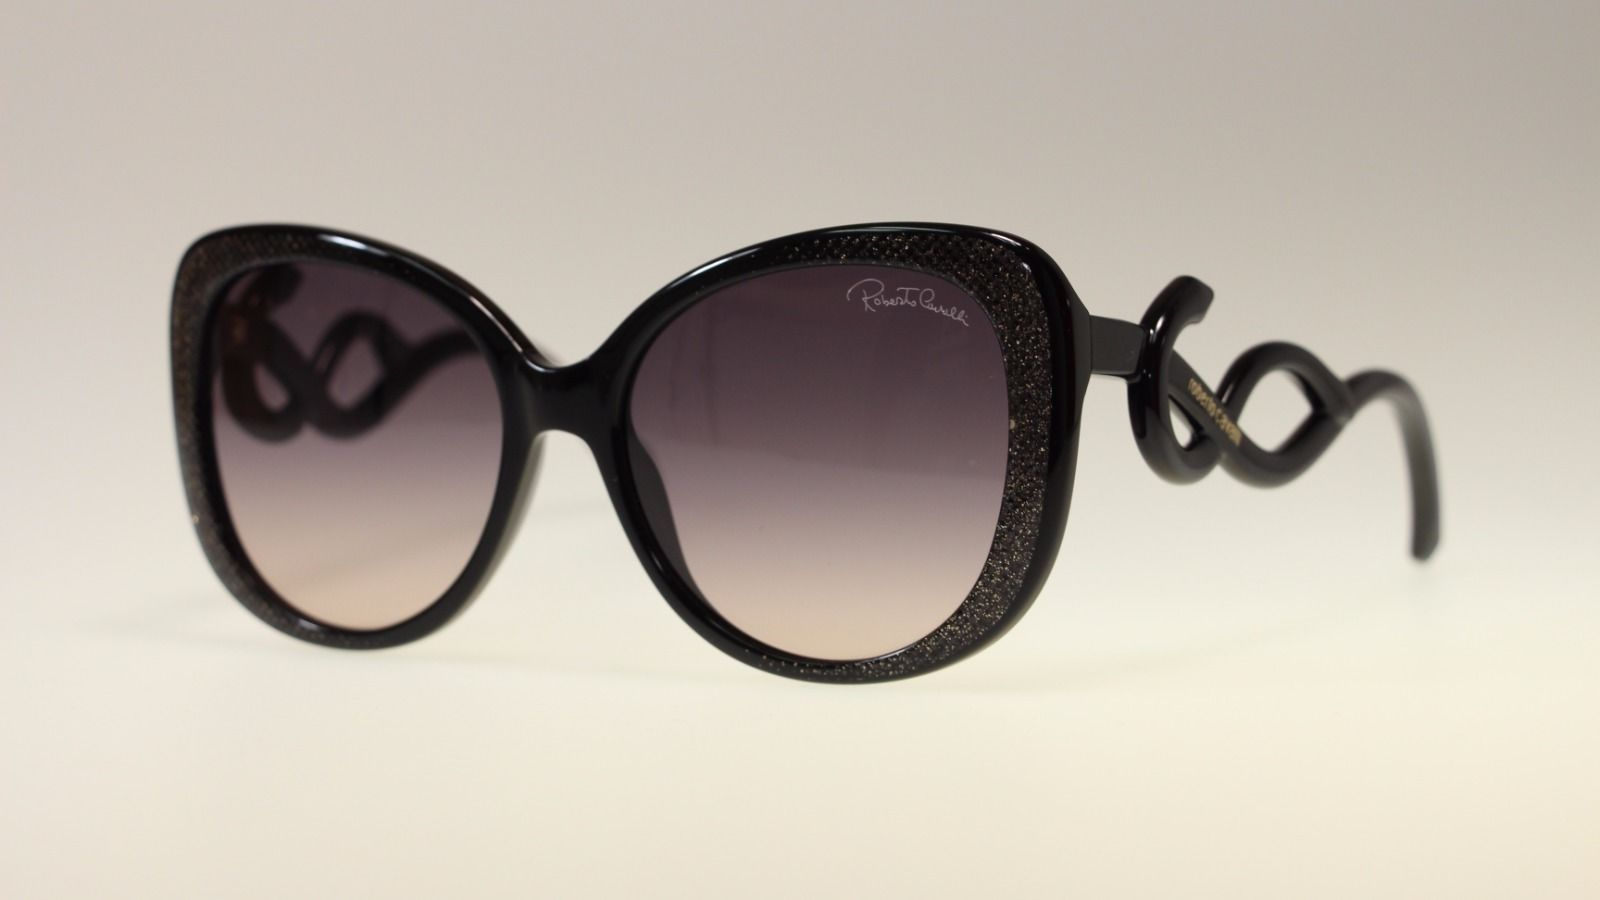 89d9a0e4d8 Roberto Cavalli Mintaka RC911 05B Shiny Black  Grey Gradient Women s  Sunglasses -  173.63